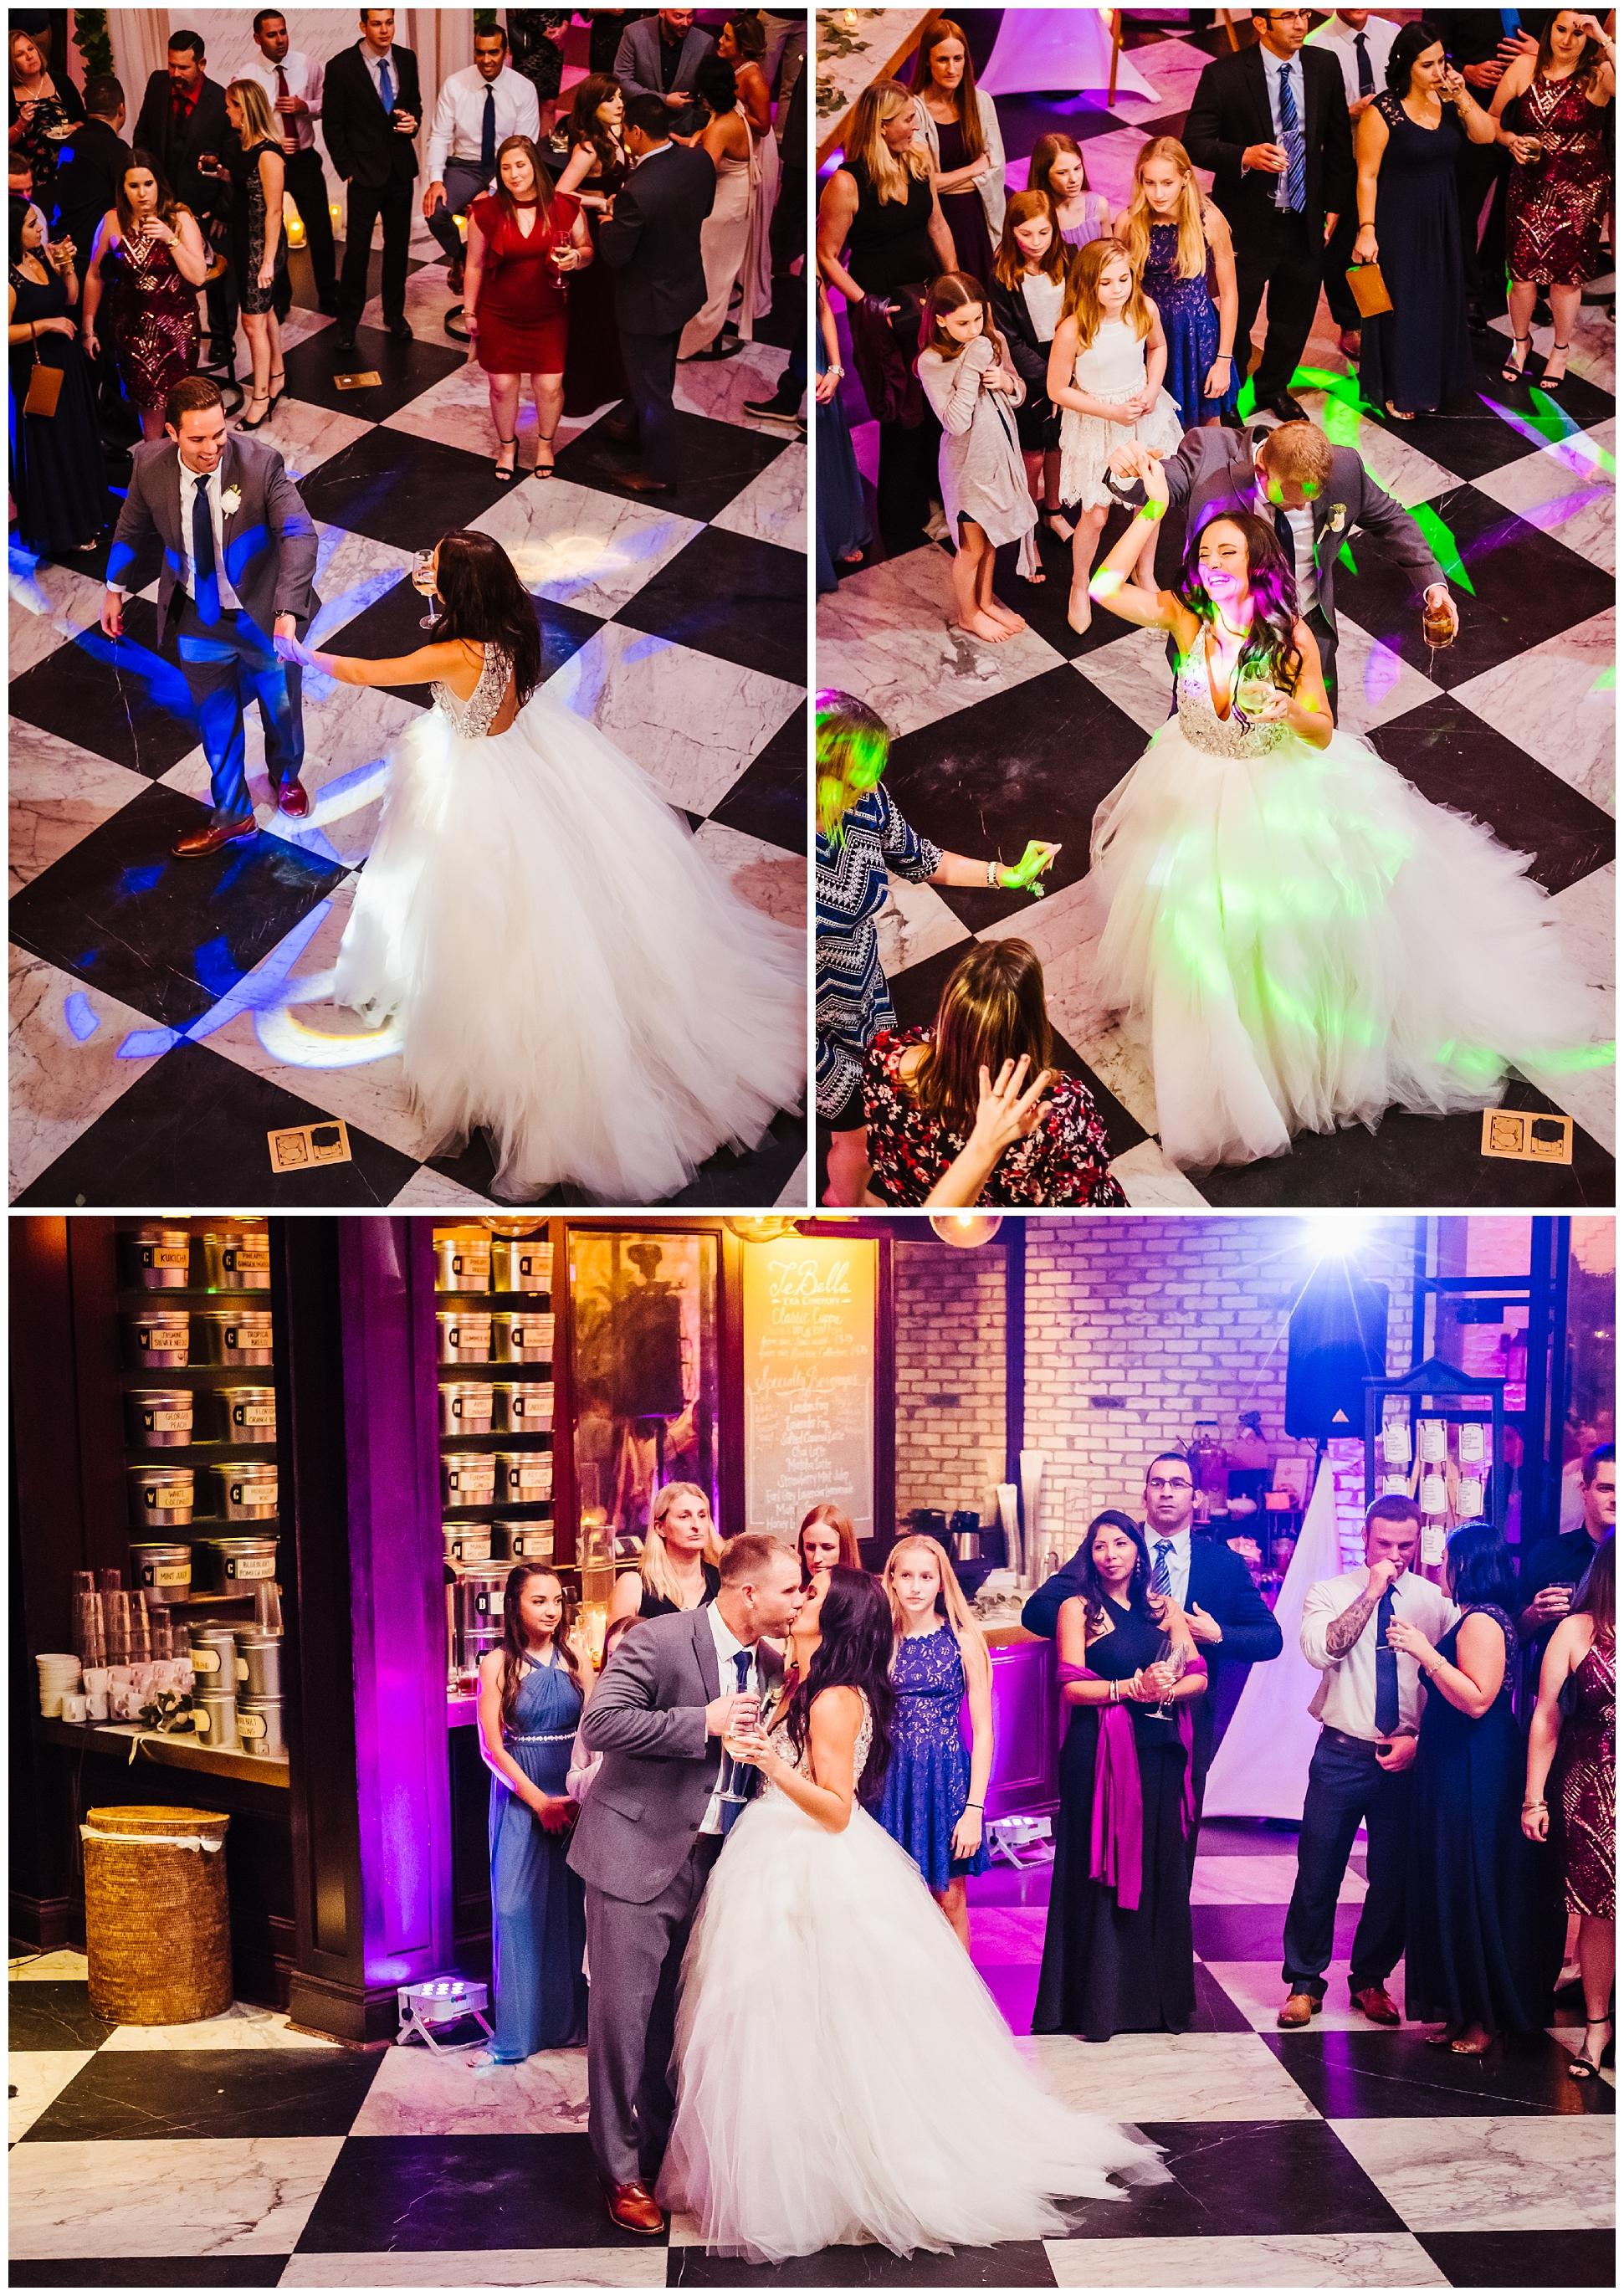 tampa-wedding-photographer-oxford-exchange-garland-candlelight-gold-hayley-paige_0057.jpg